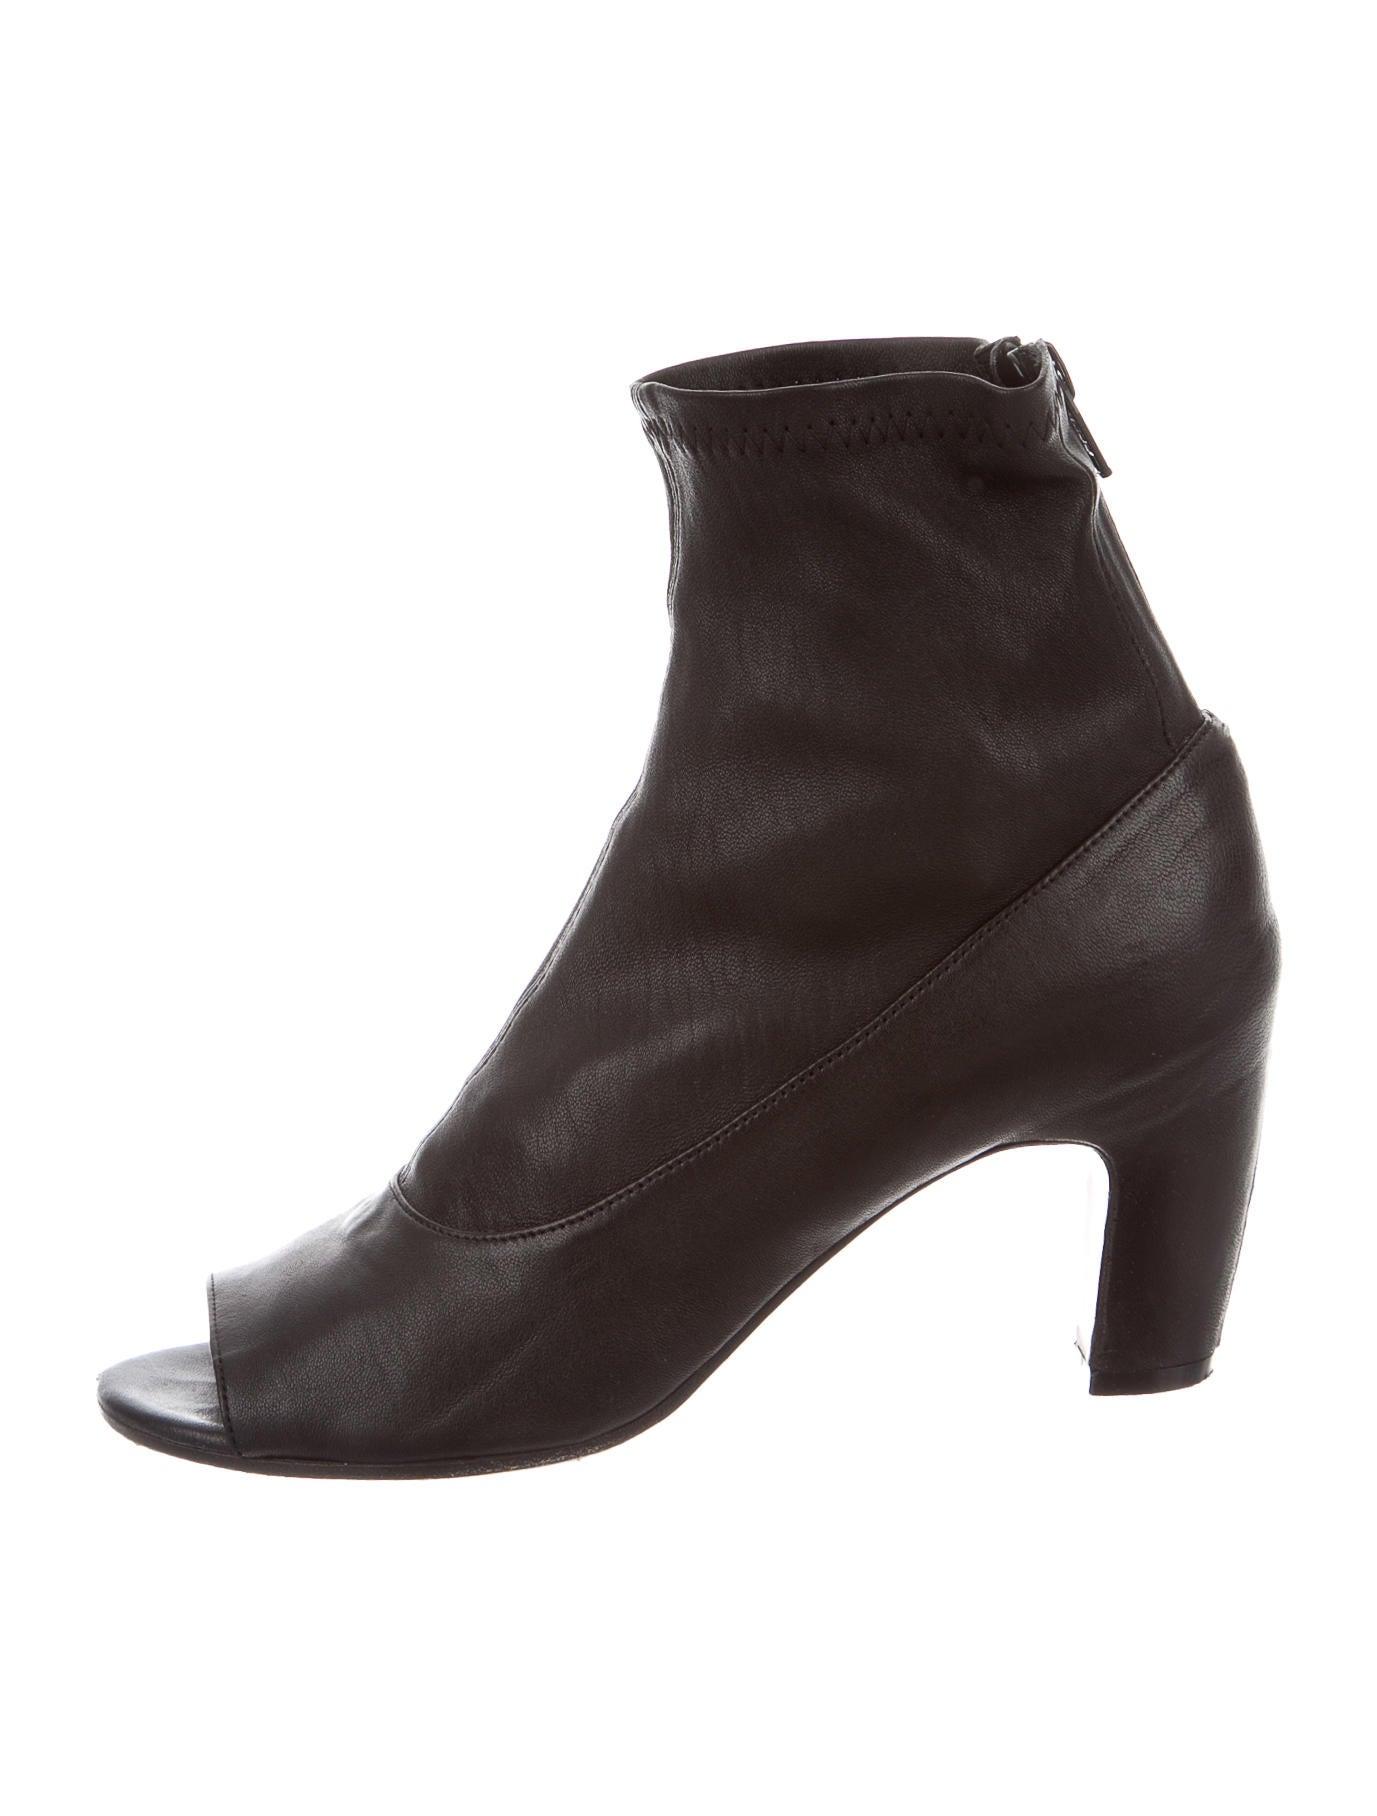 maison martin margiela leather peep toe booties shoes mai24264 the realreal. Black Bedroom Furniture Sets. Home Design Ideas